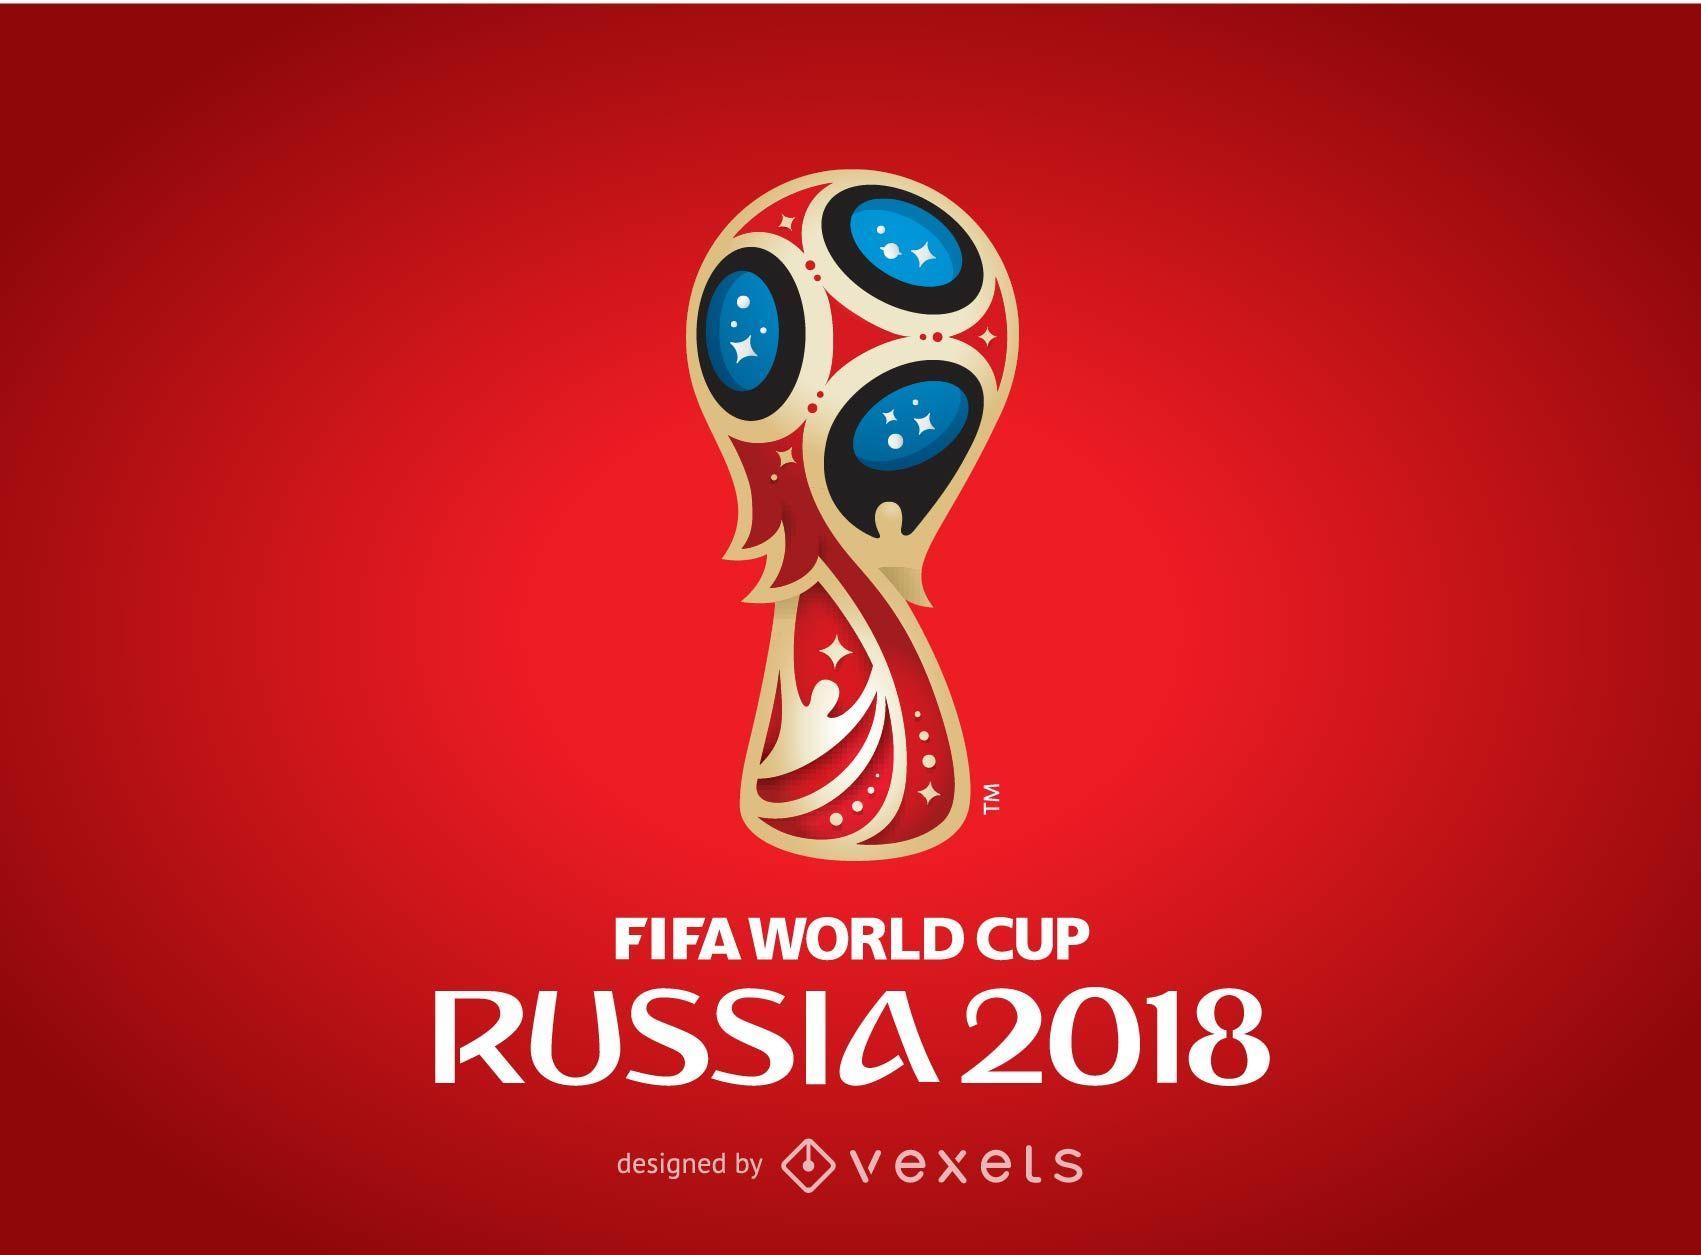 Russland 2018 Logo Poster